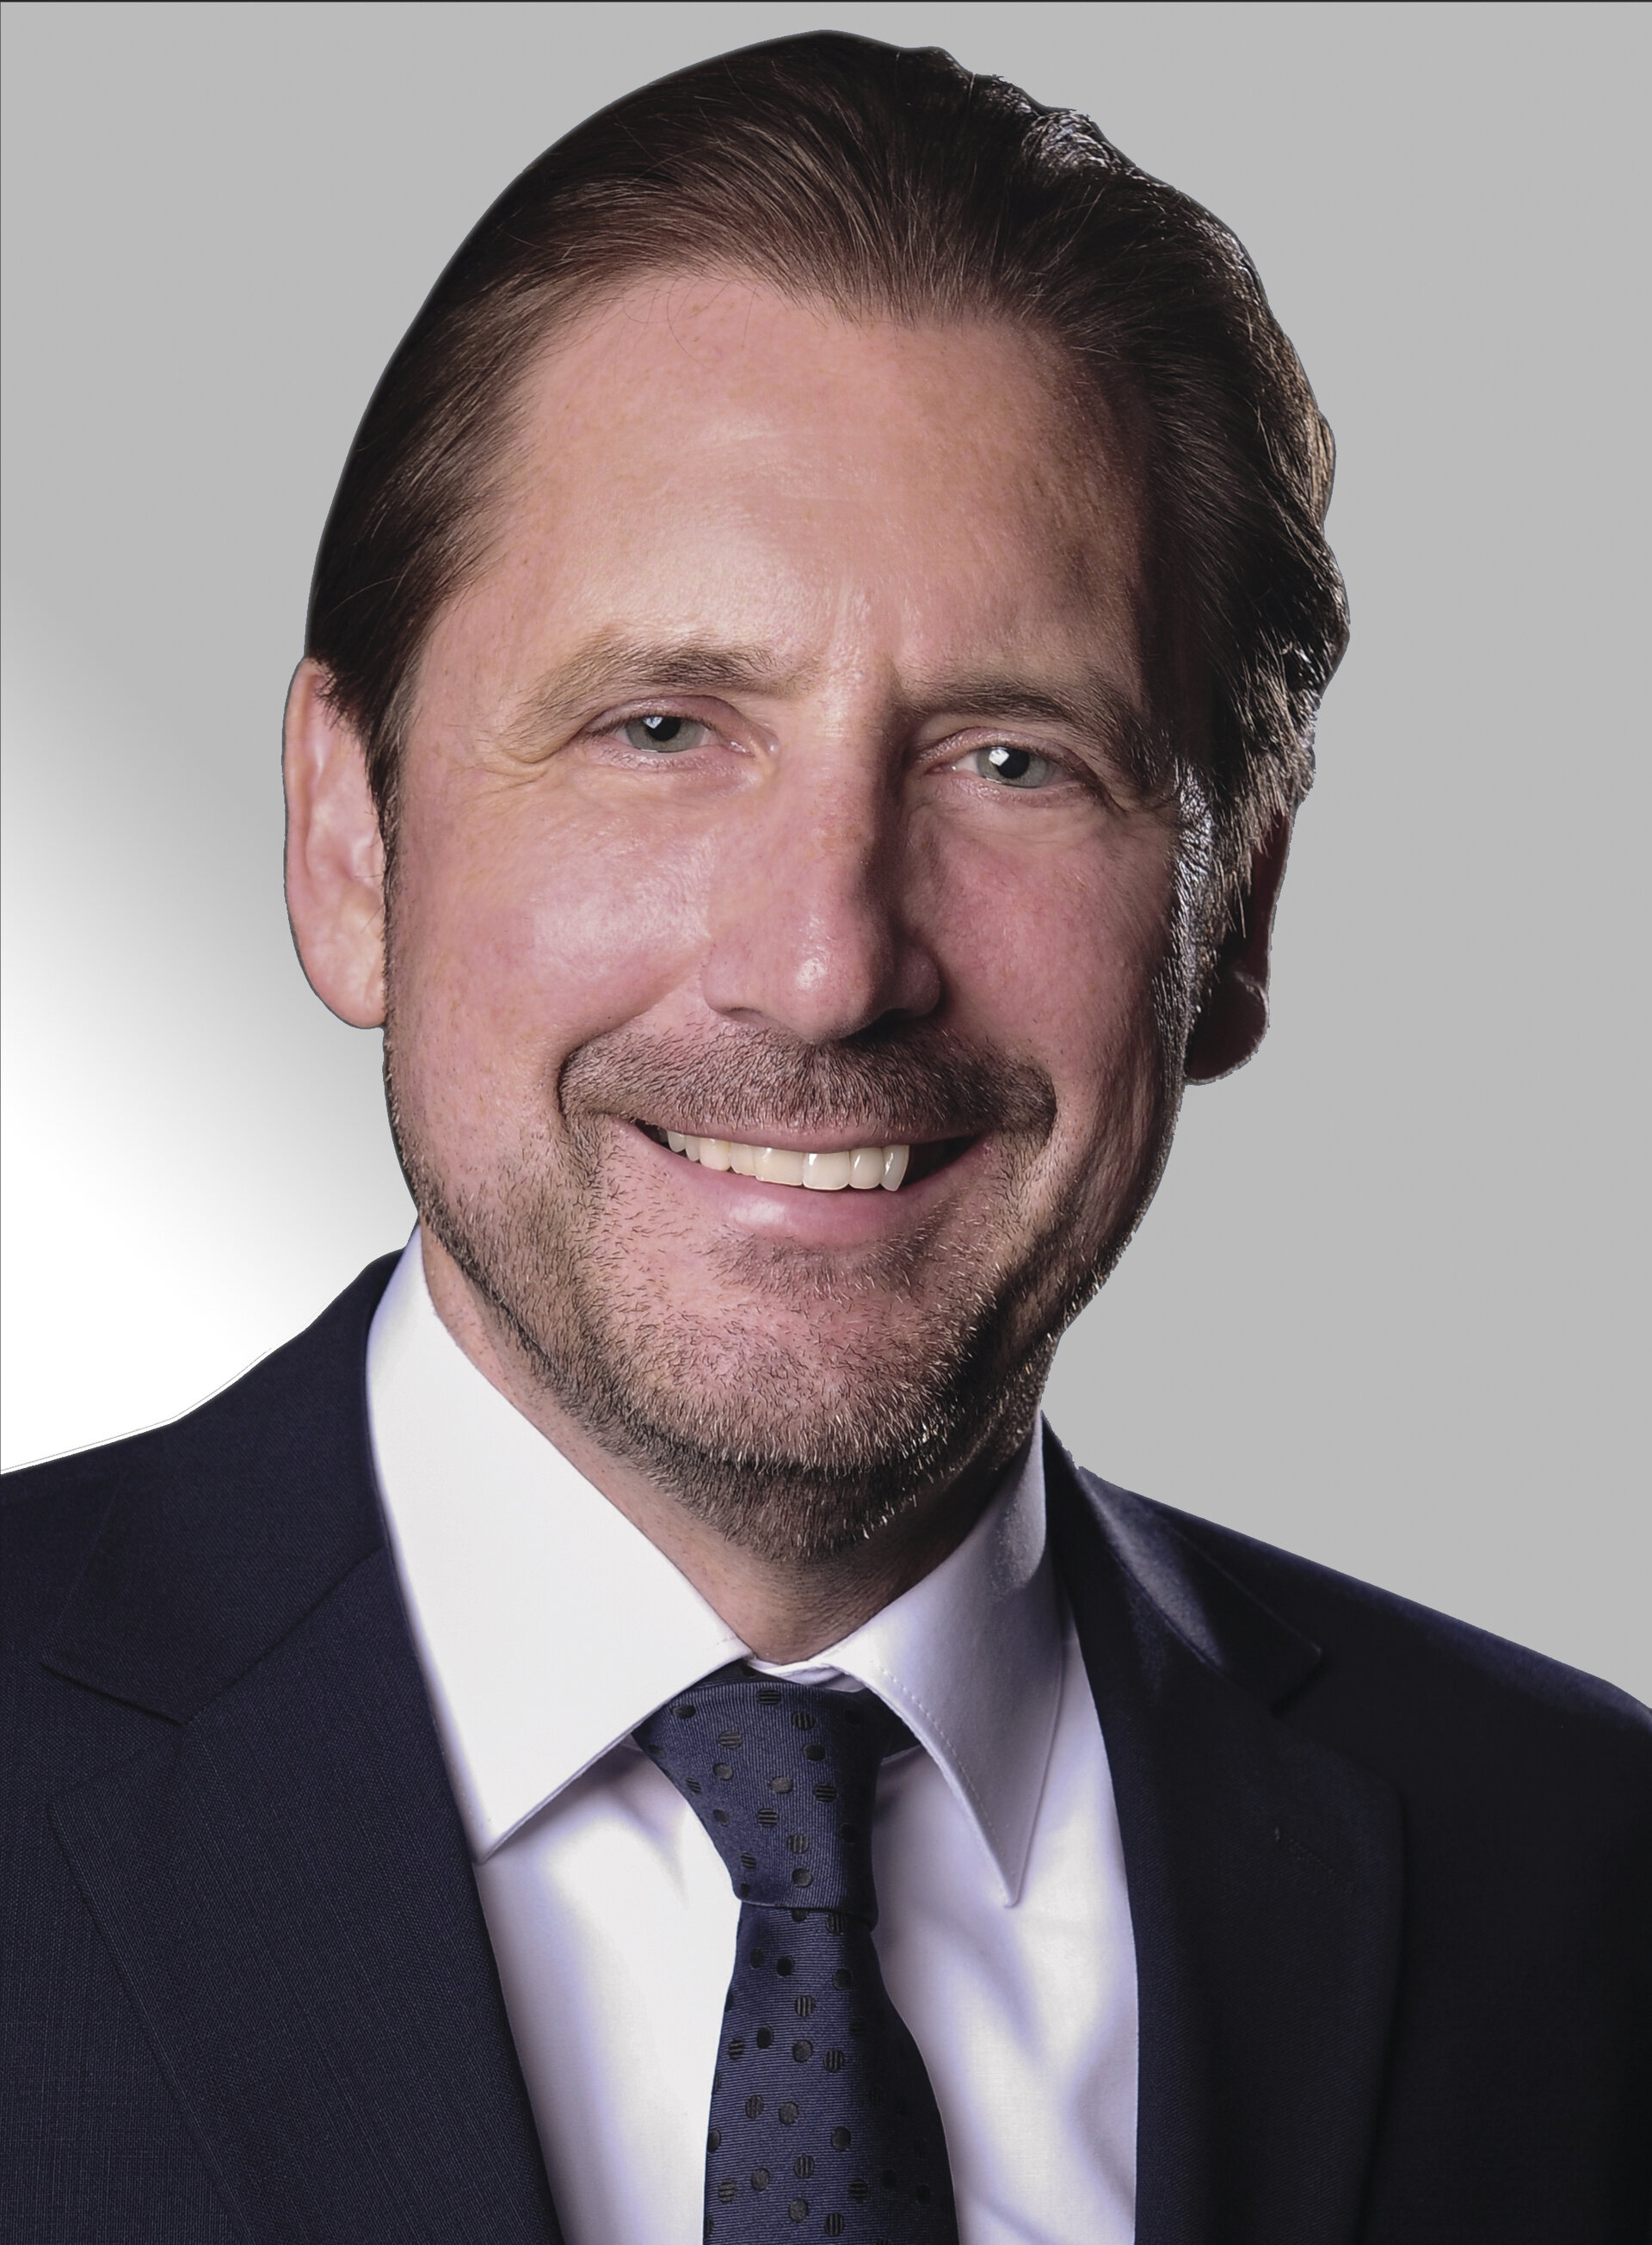 Bürgermeister Peter Unkel